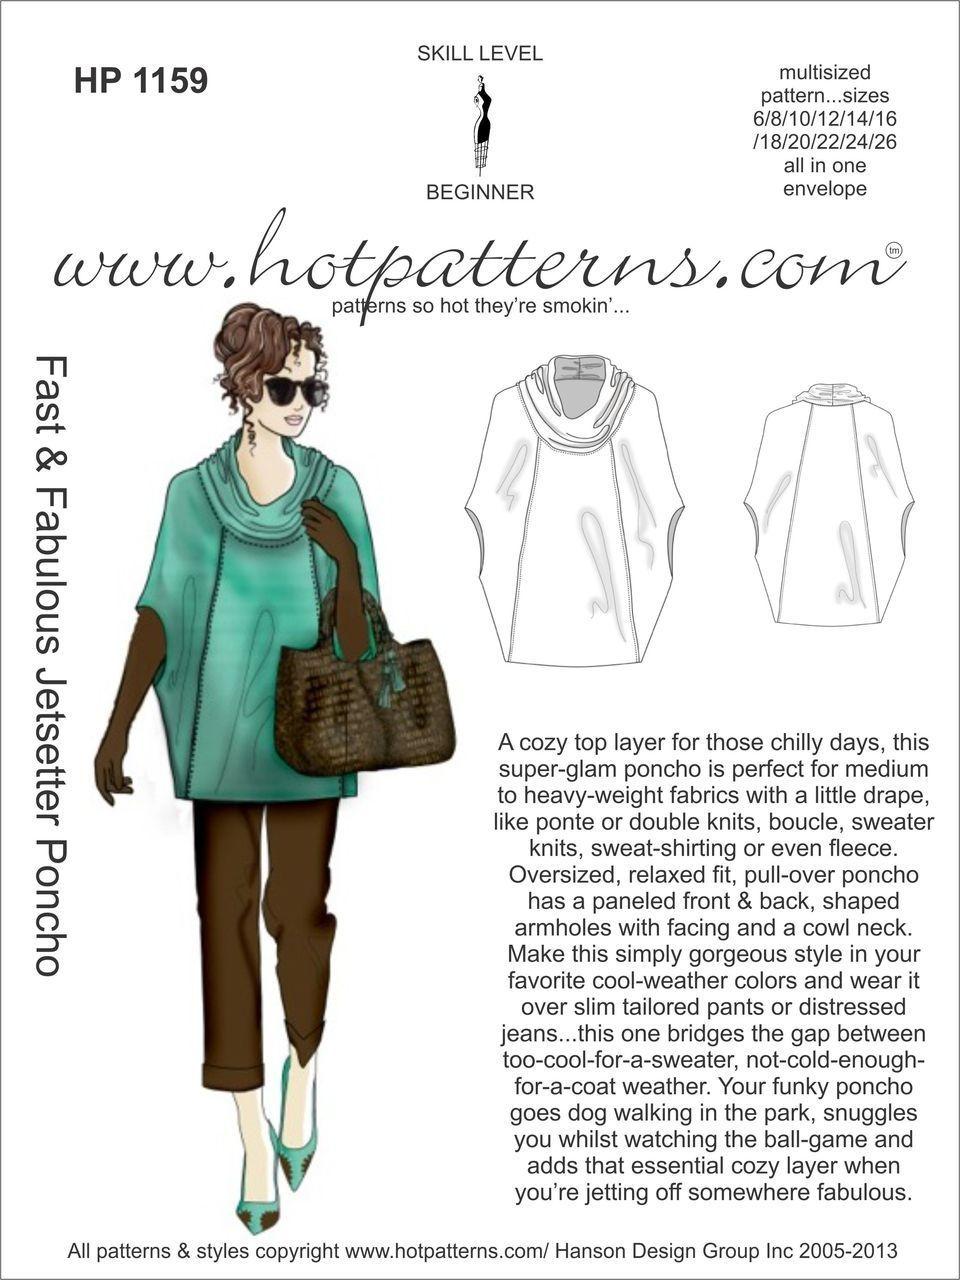 HP 1159 Fast & Fabulous Jetsetter Poncho | Hot patterns .com ...